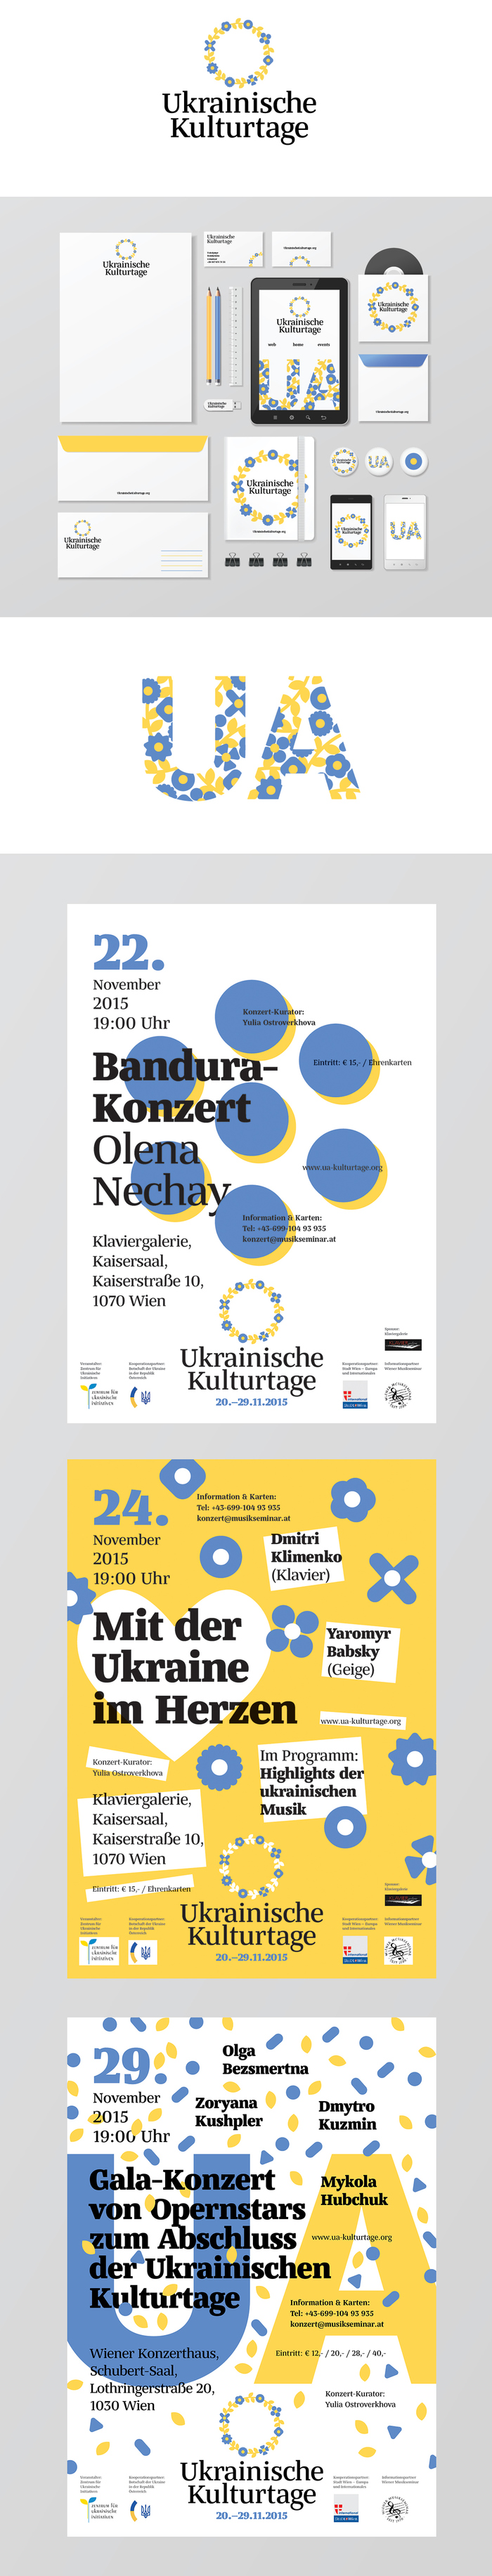 Ukrainische Kulturtage in Wien